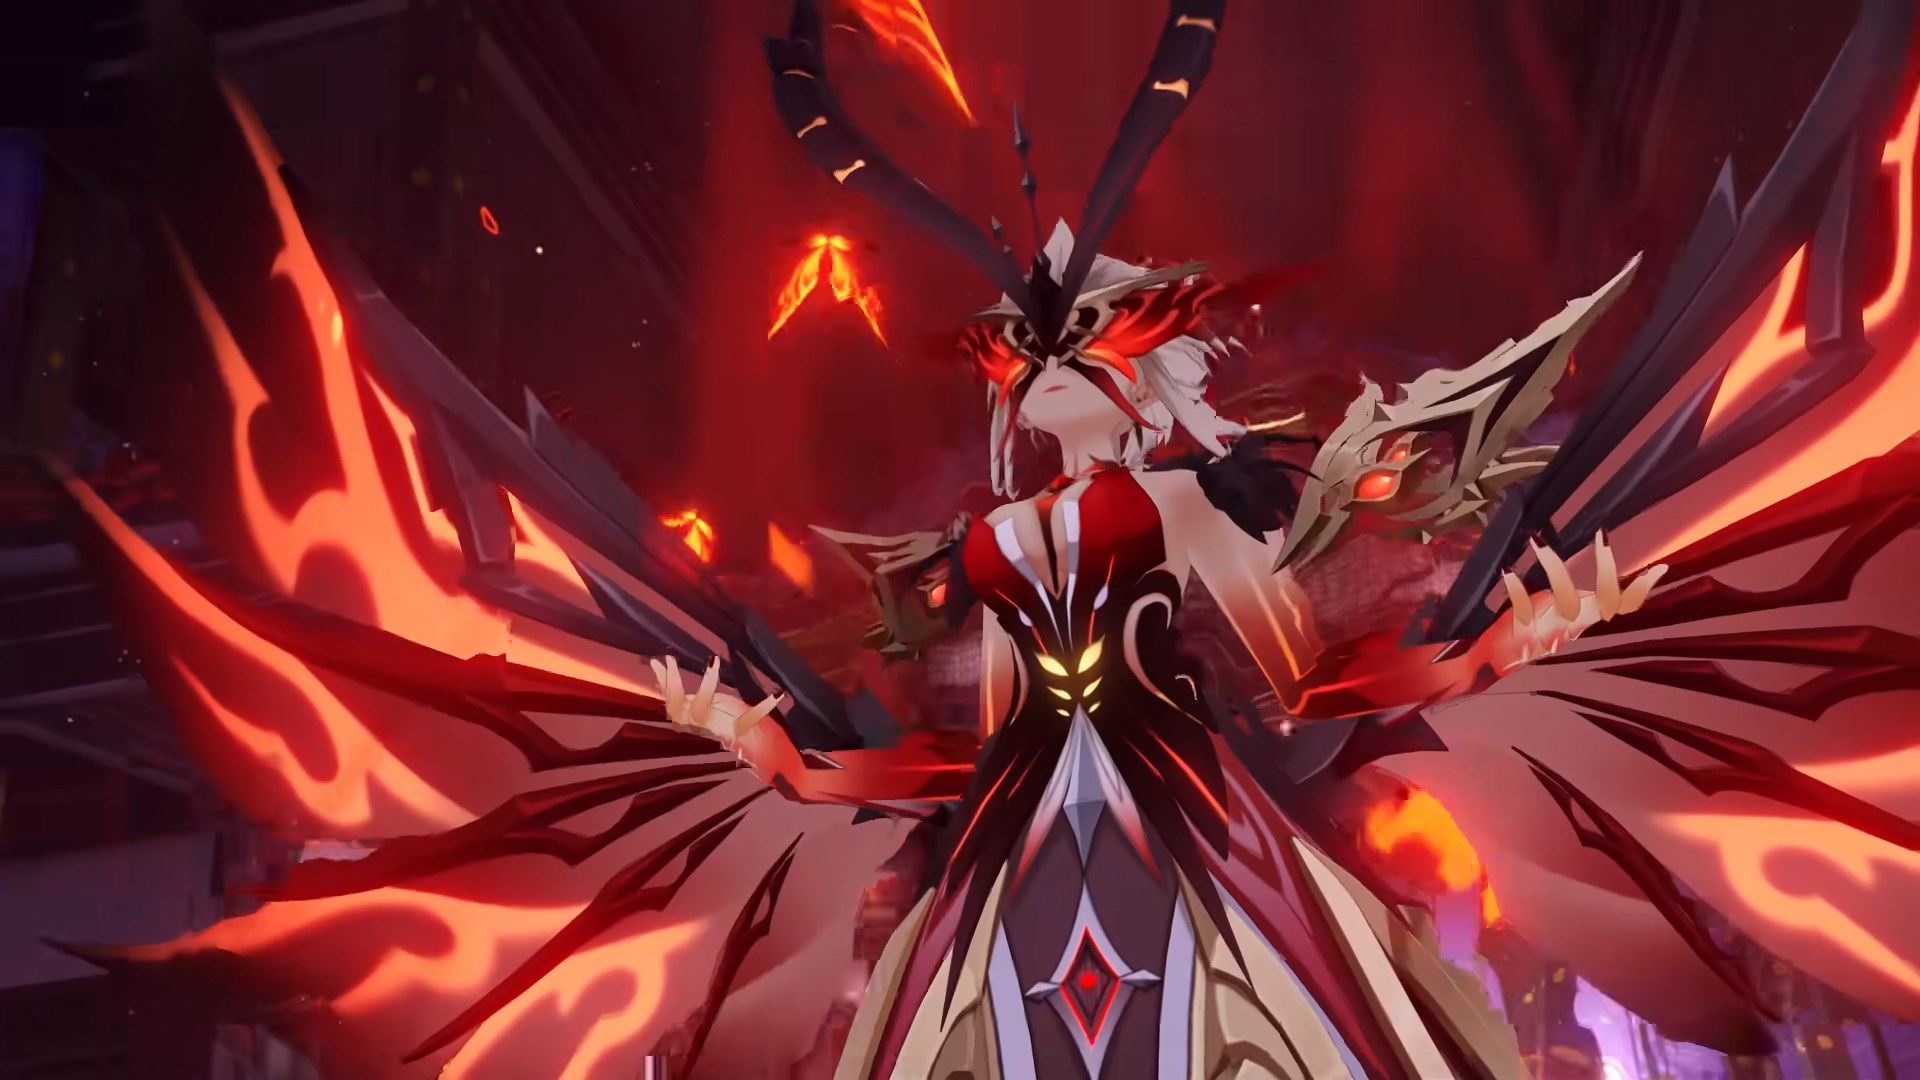 La Signora as her fire form in Genshin Impact